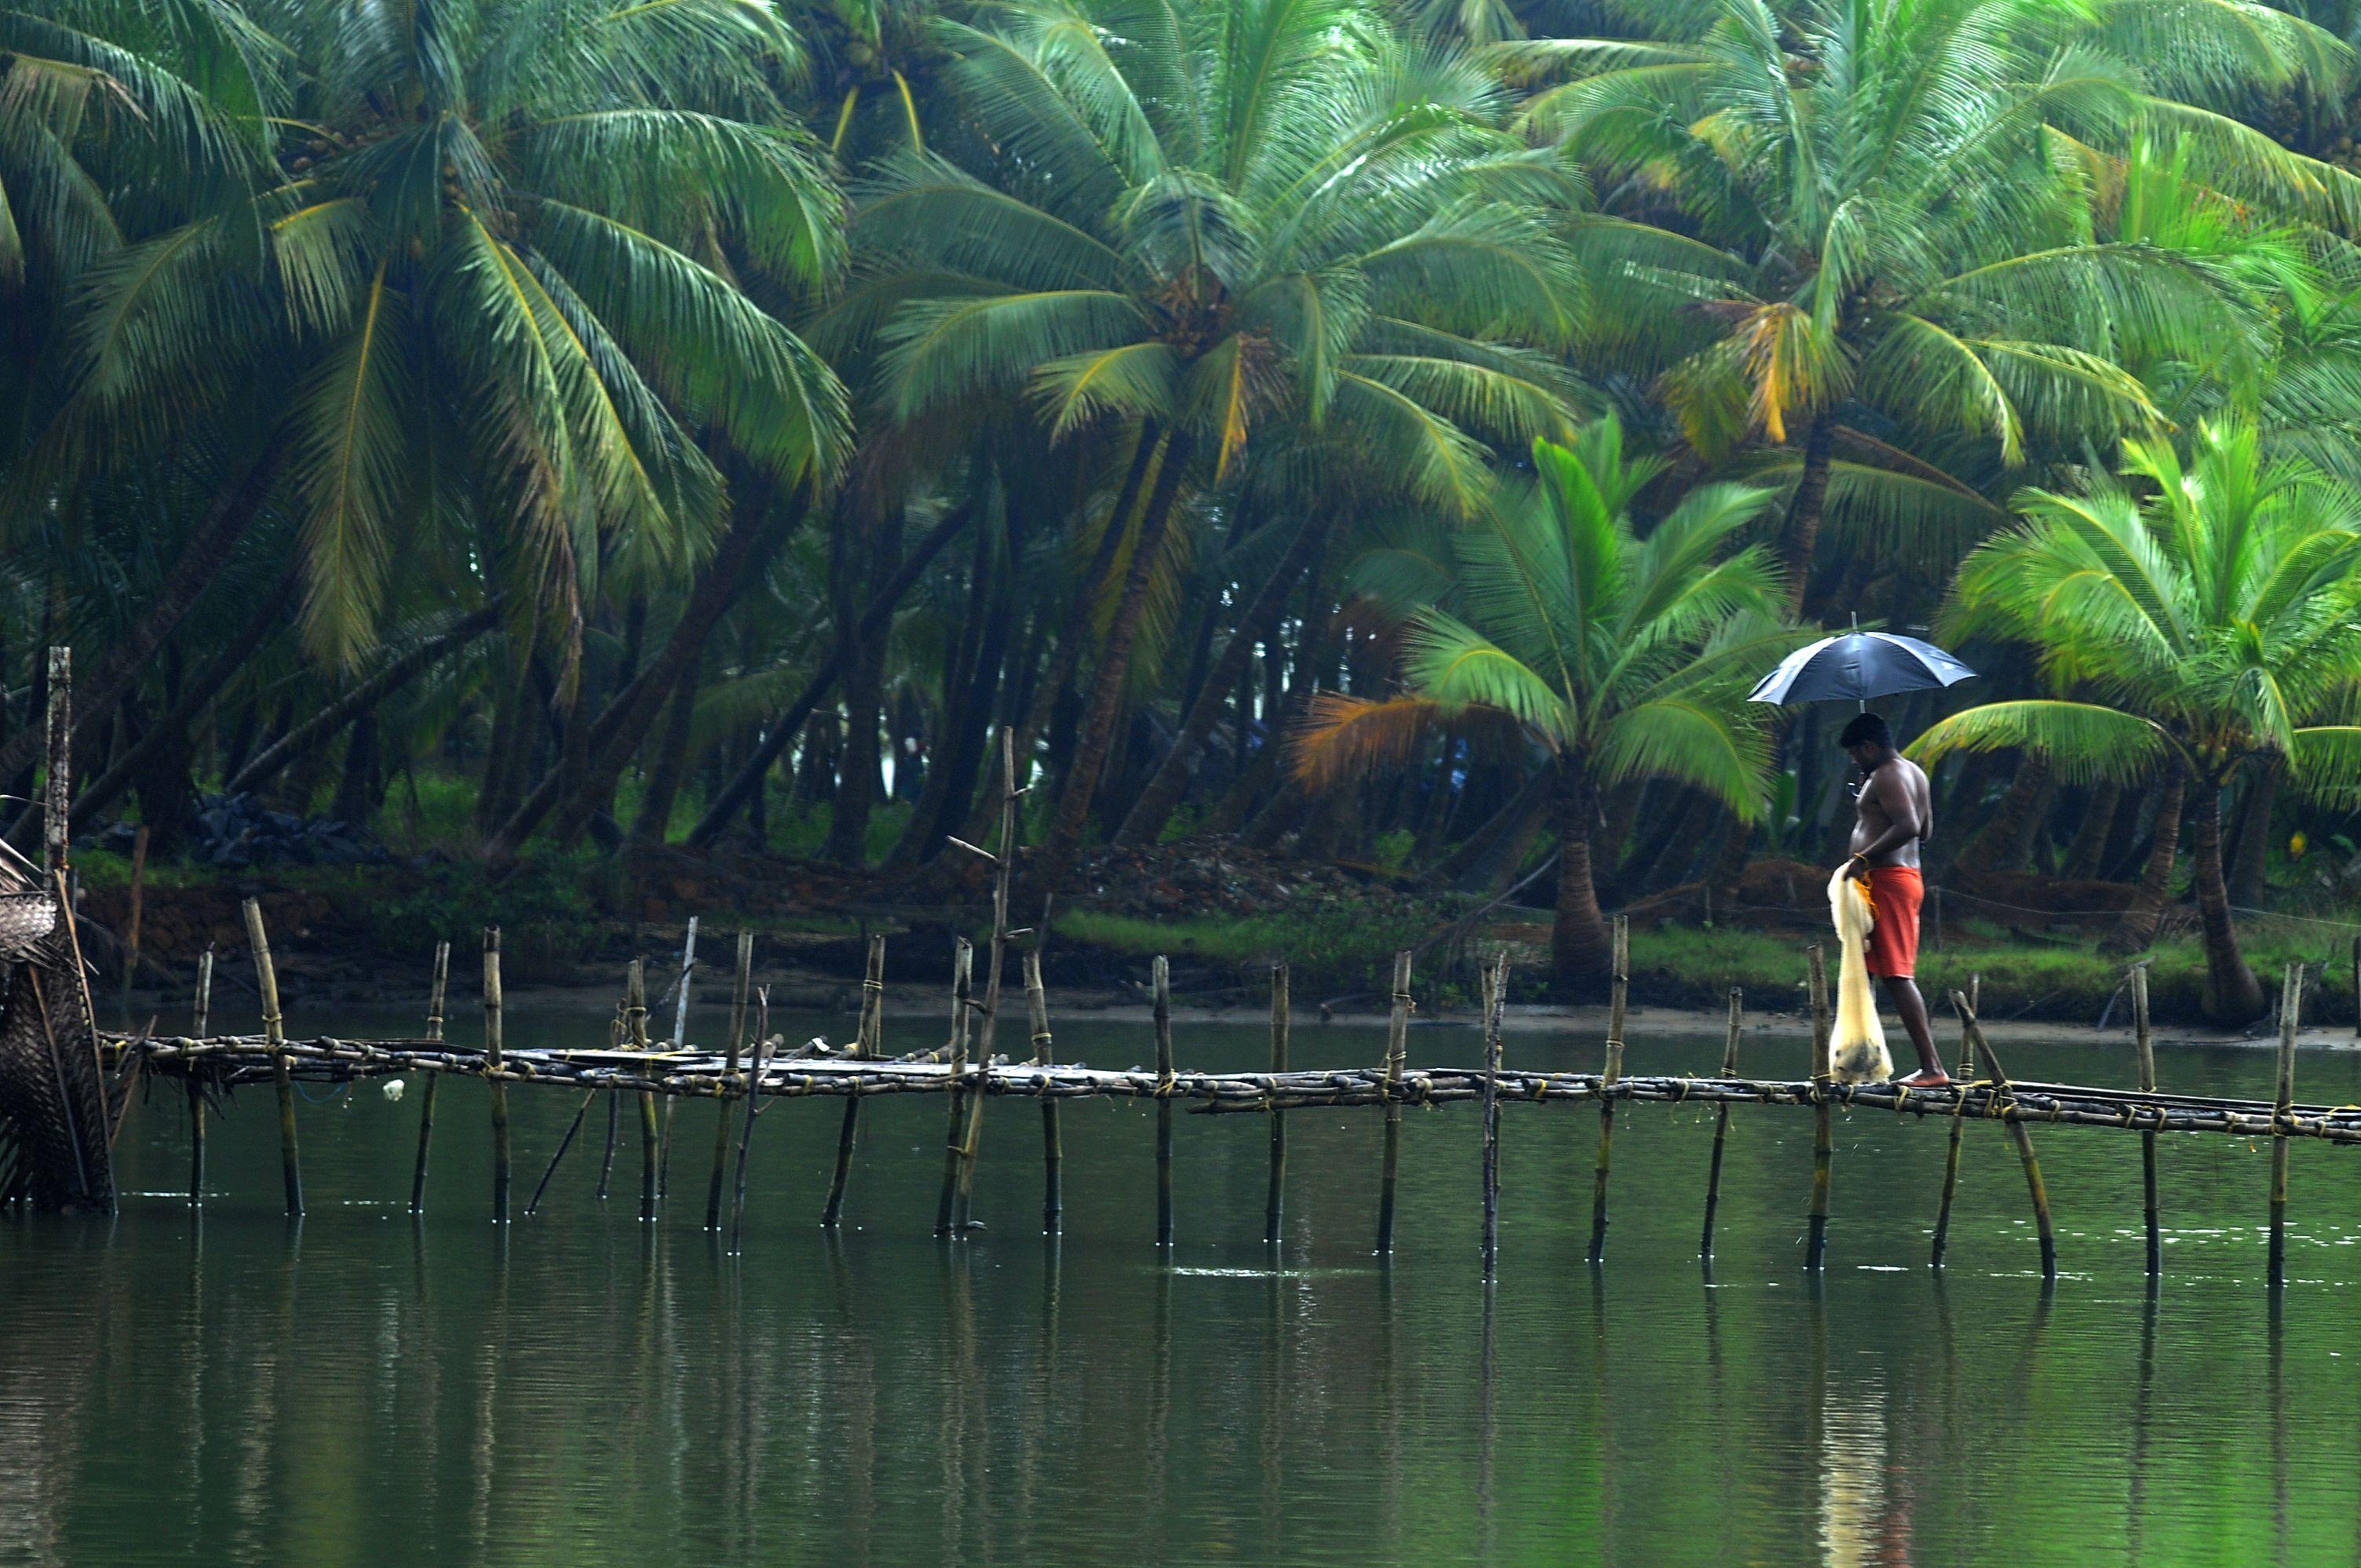 Kerala Backwaters South India INDIA'S BEAUTY South